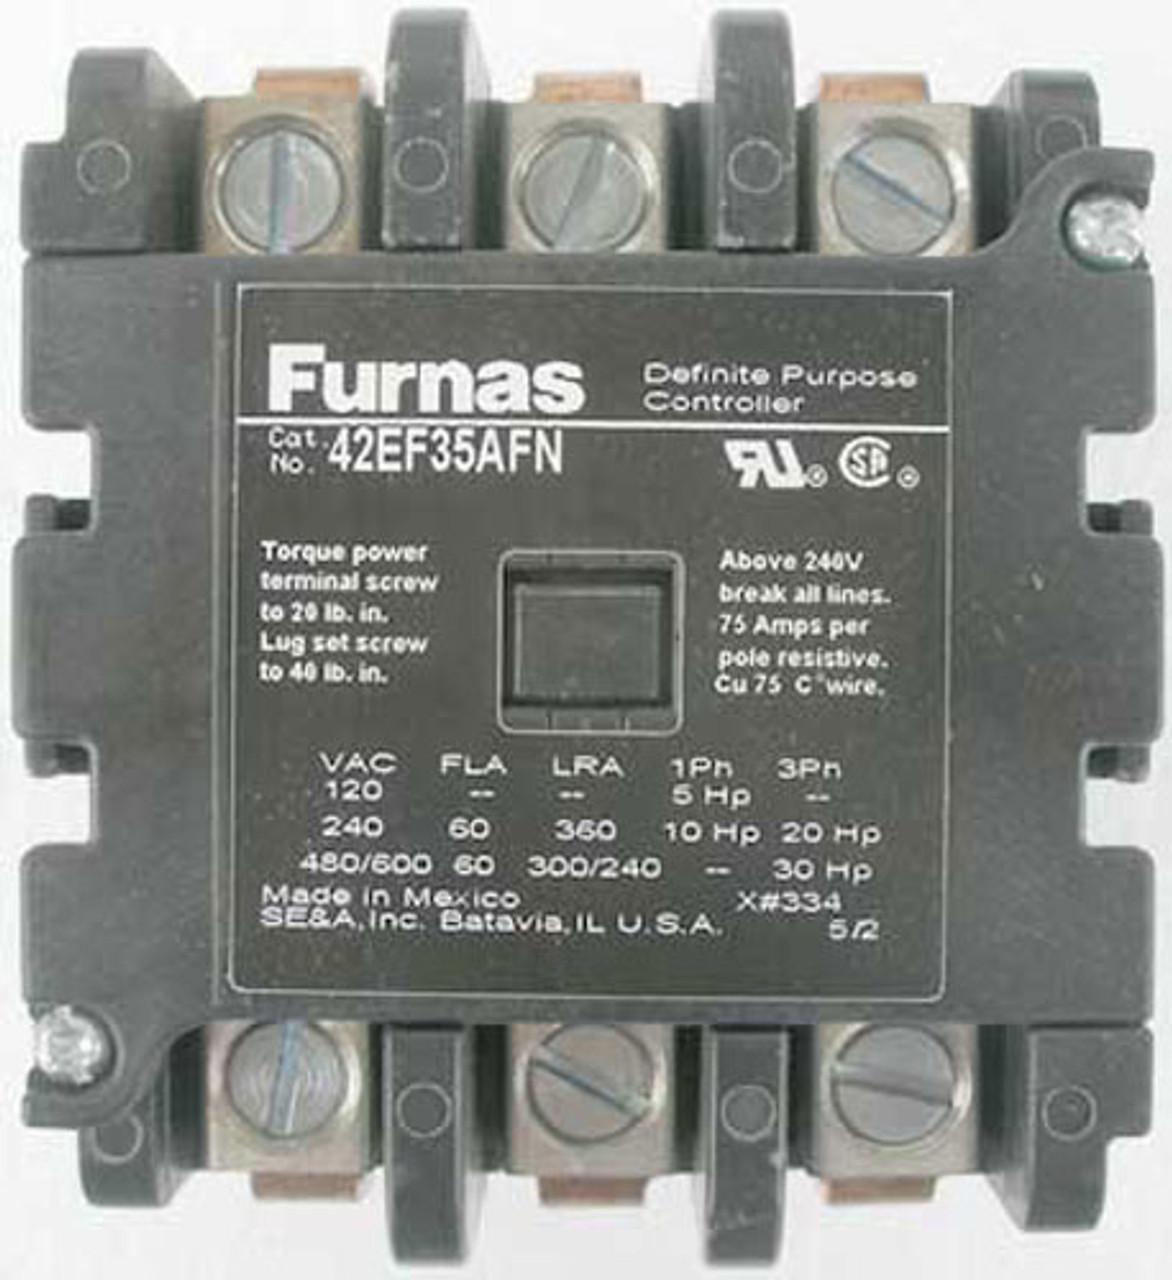 Furnas 42EF35AFN 3 Pole, FL 60 Amp, Definite Purpose Controller - New